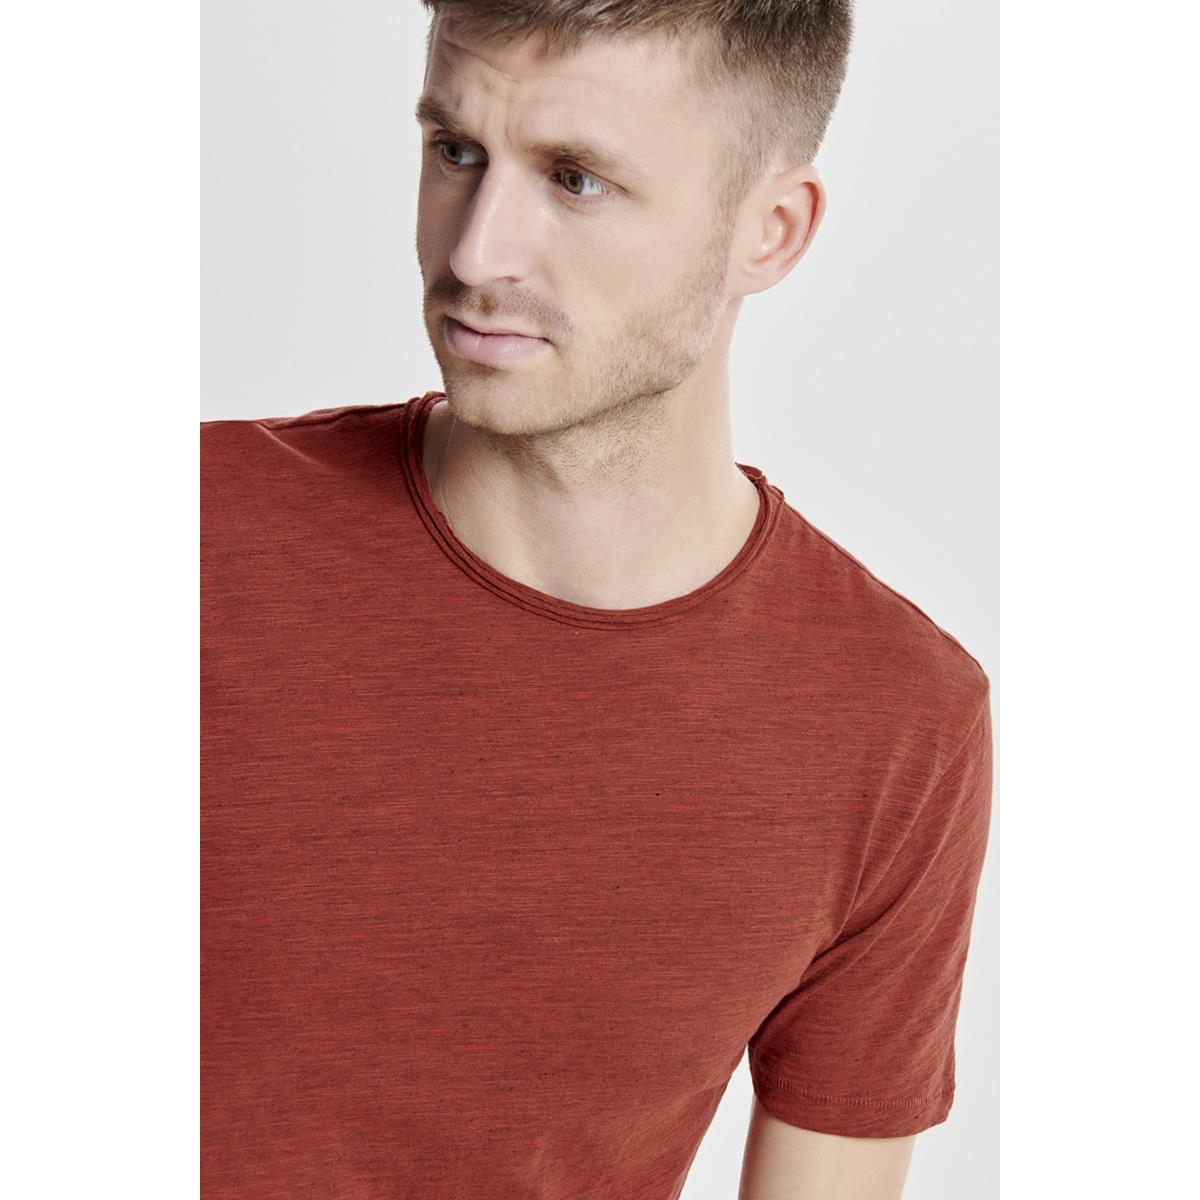 onsalbert new ss tee noos 22005108 only & sons t-shirt rooibos tea